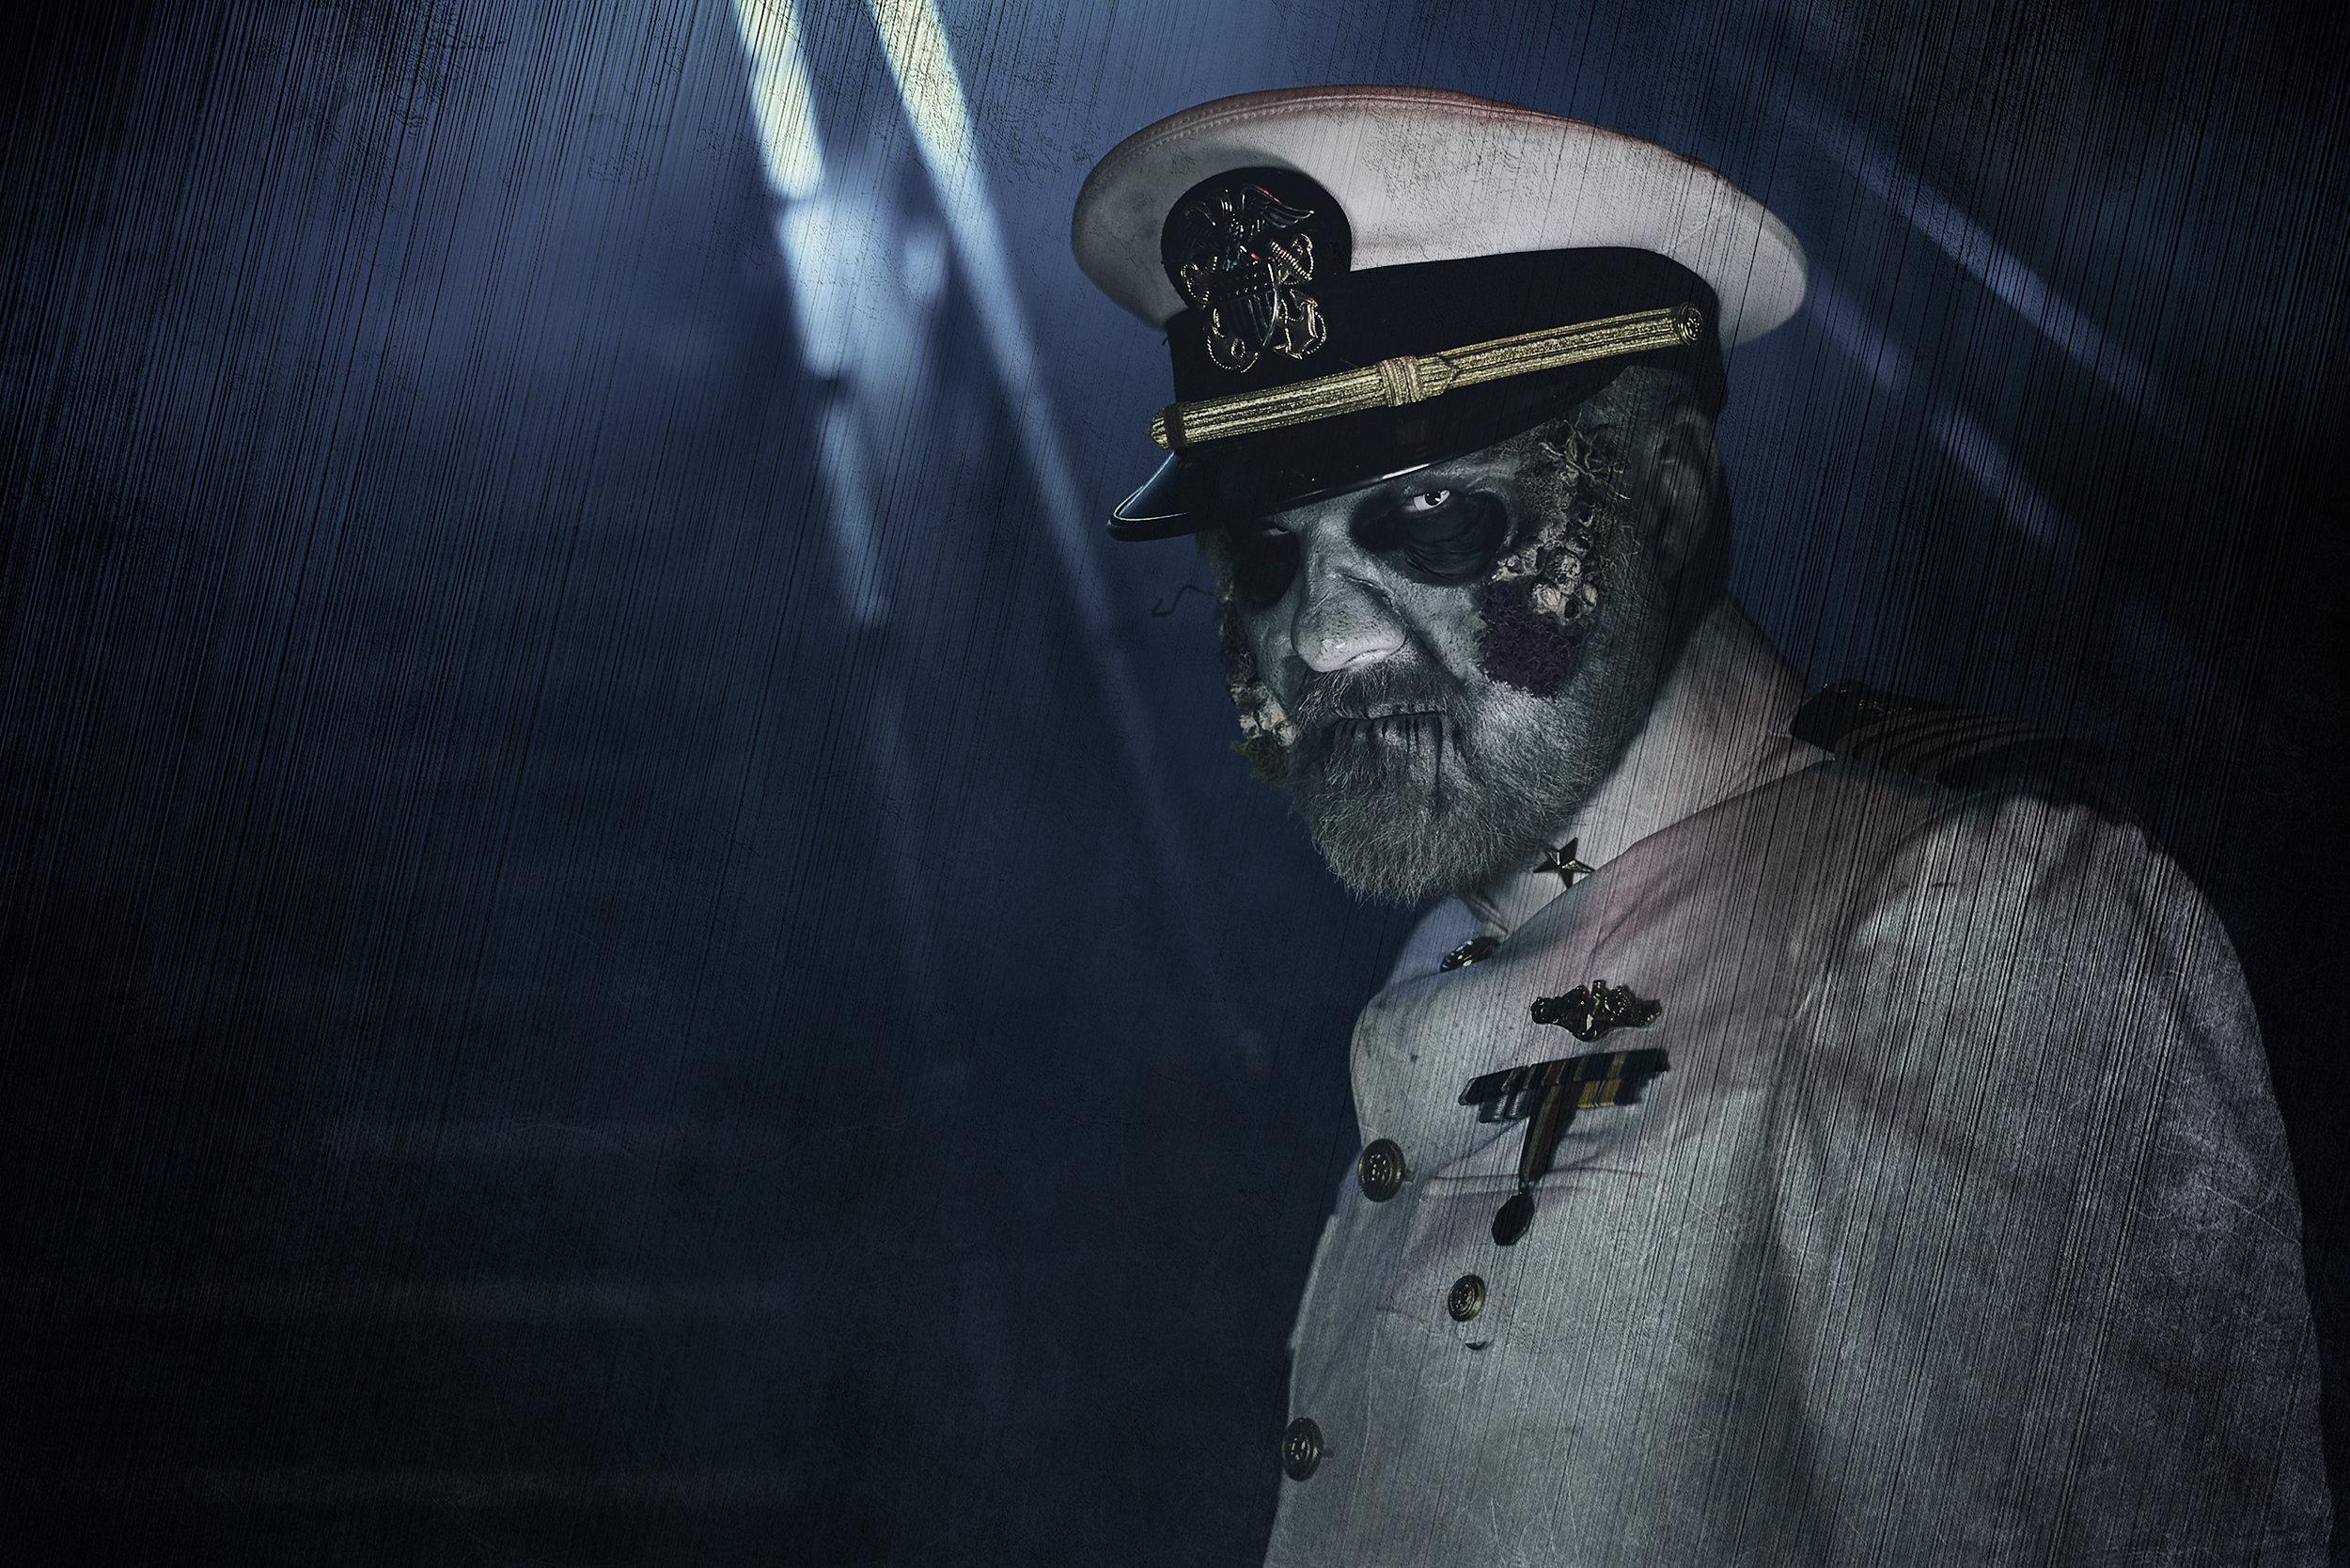 STAIRCASE_Captain_2330.jpg